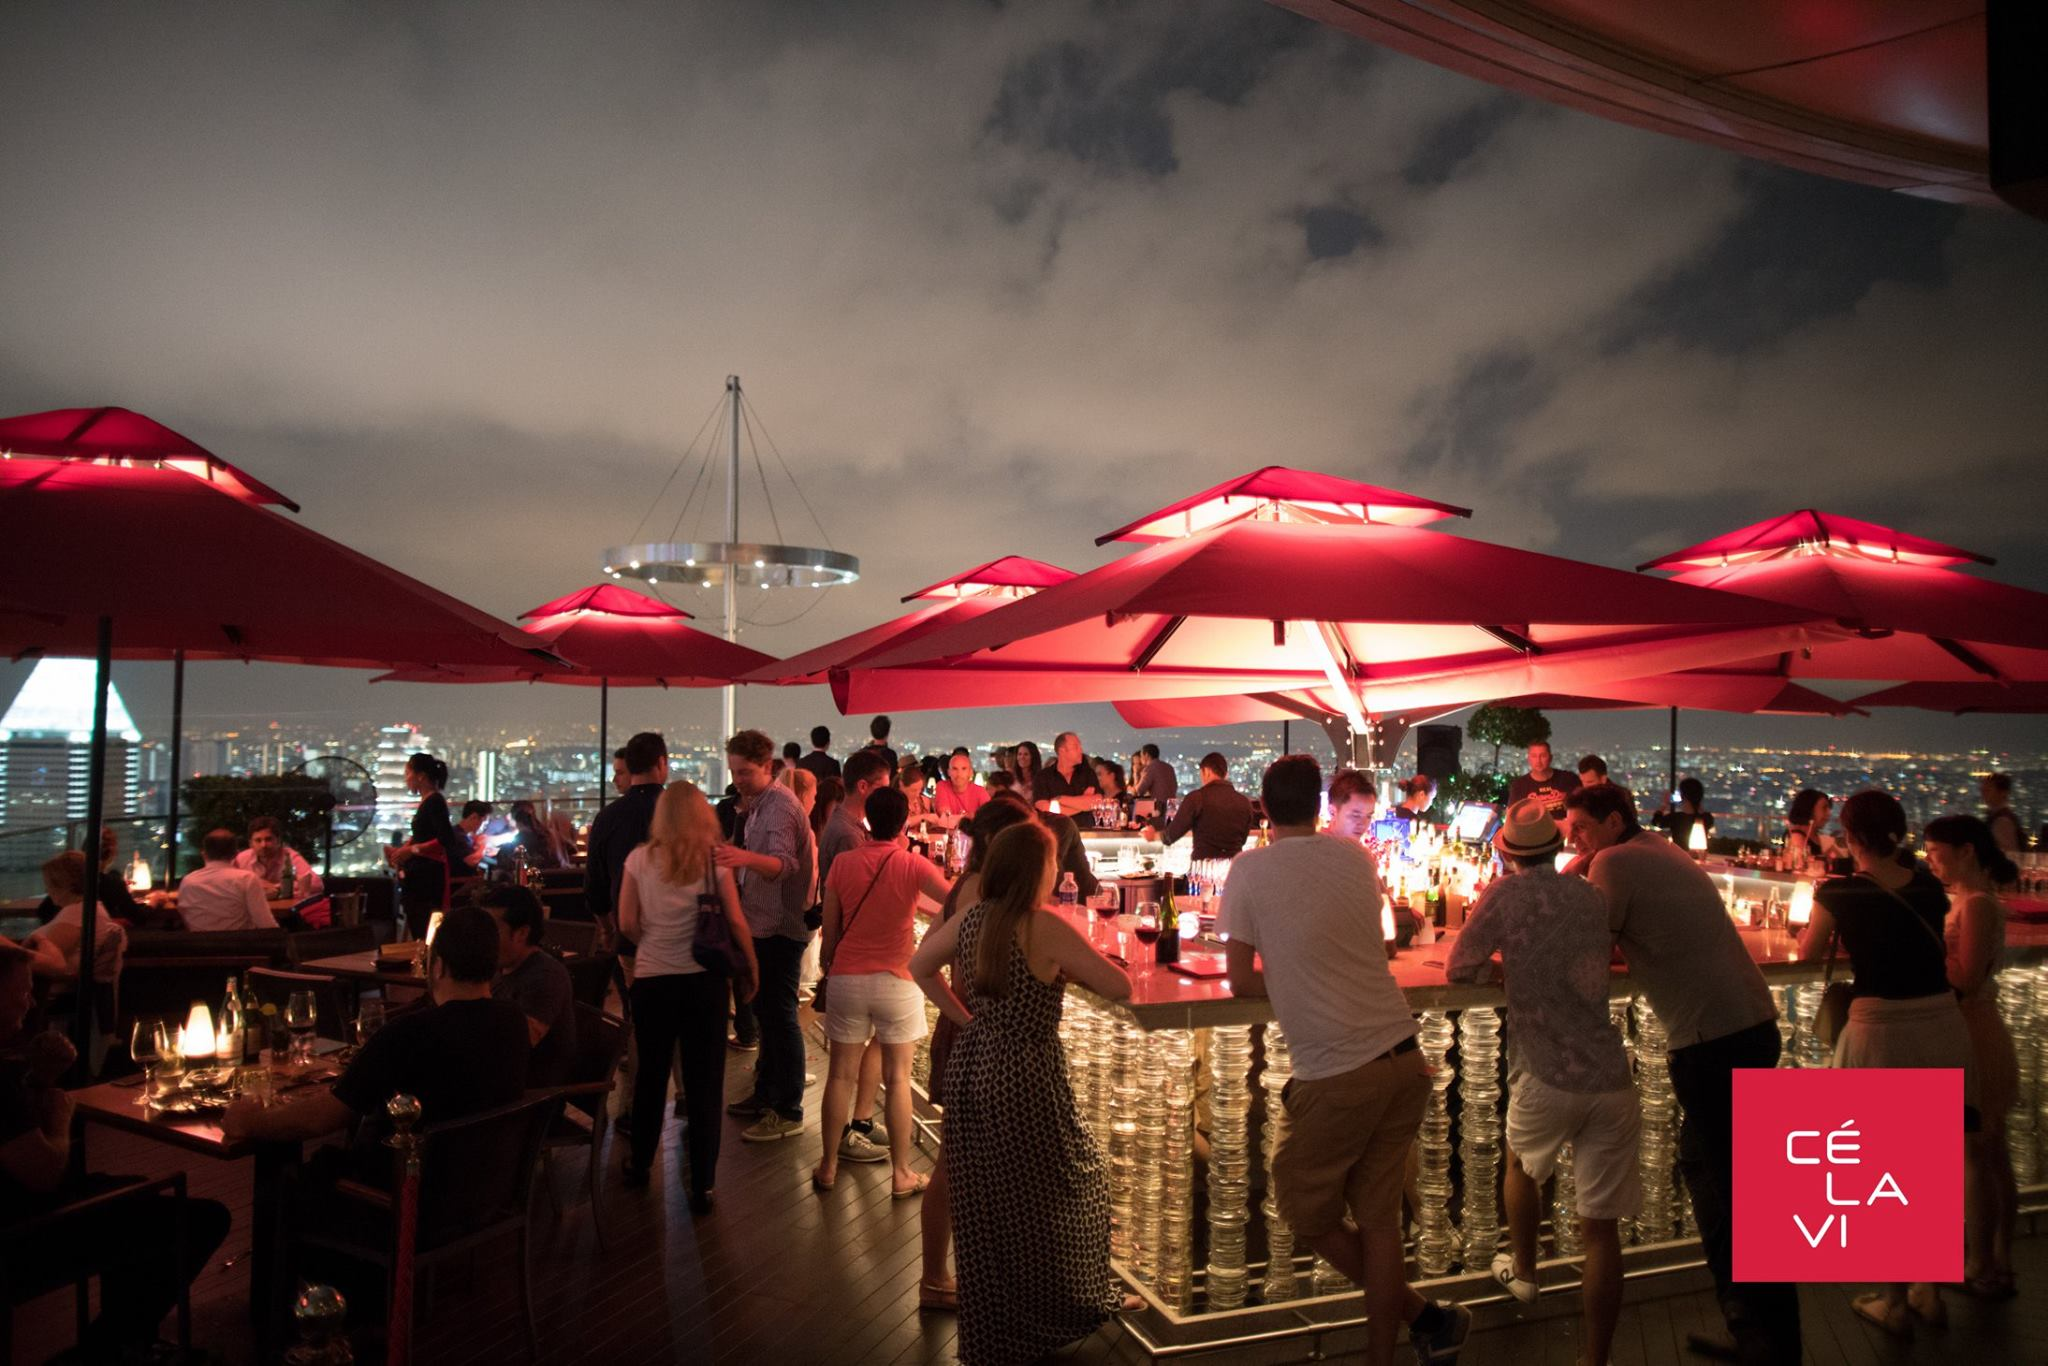 C 201 La Vi Singapore Rooftop Club On Marina Bay Sands Hotel